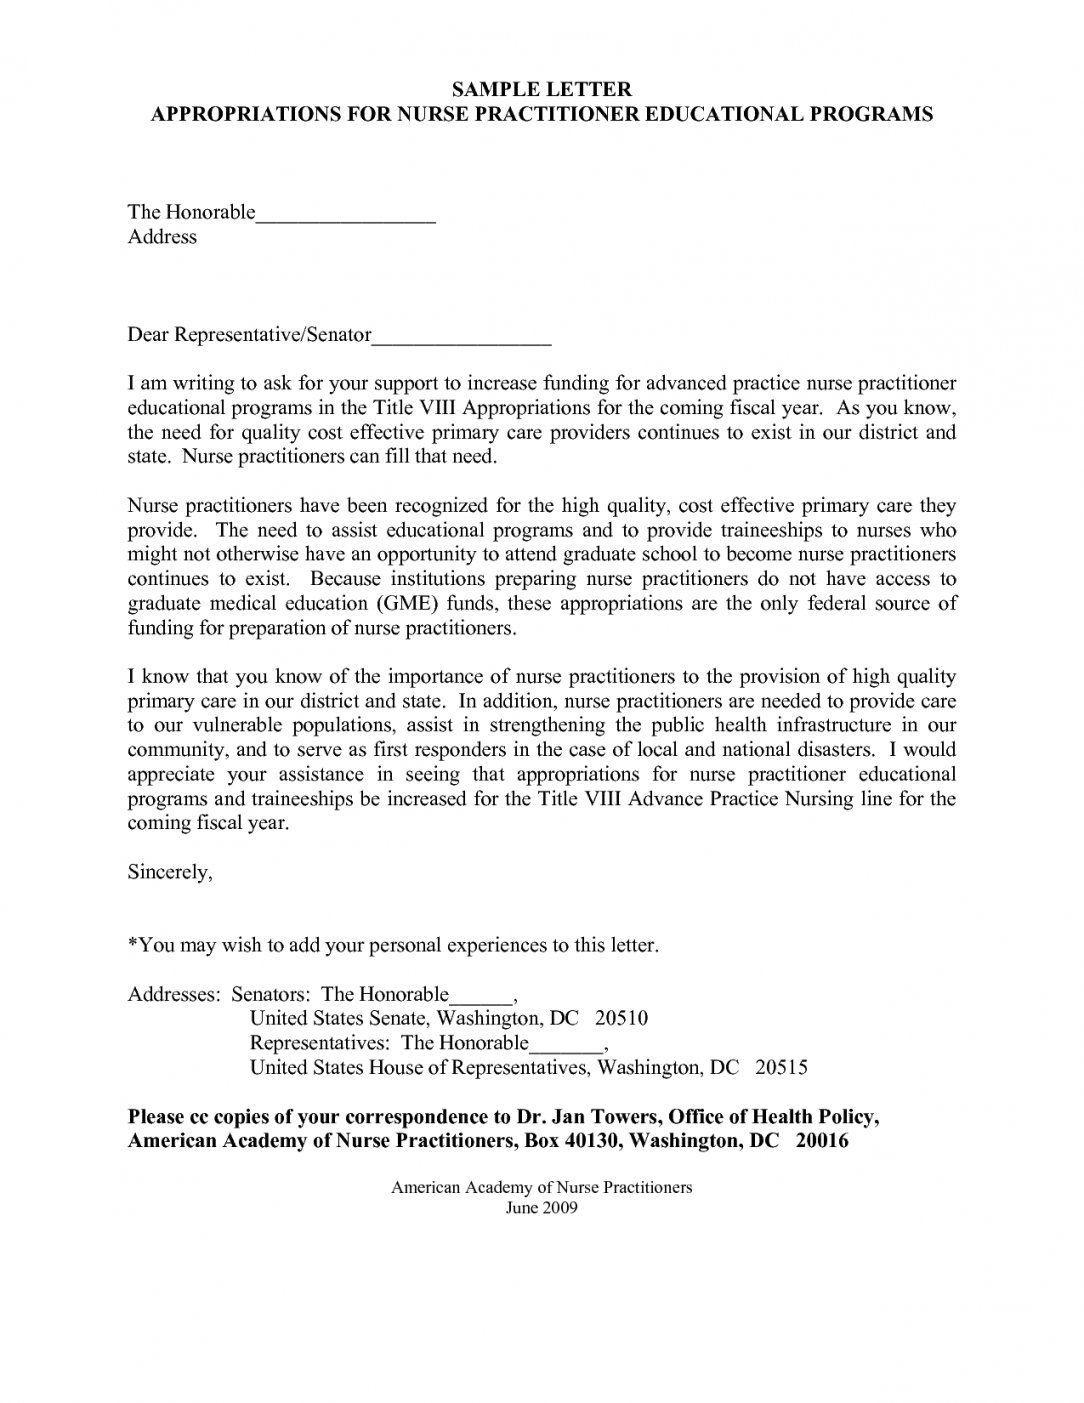 Cover Letter Template Nurse Practitioner Nursing Cover Letter Cover Letter For Resume Resume Cover Letter Examples Nurse practitioner cover letter new grad